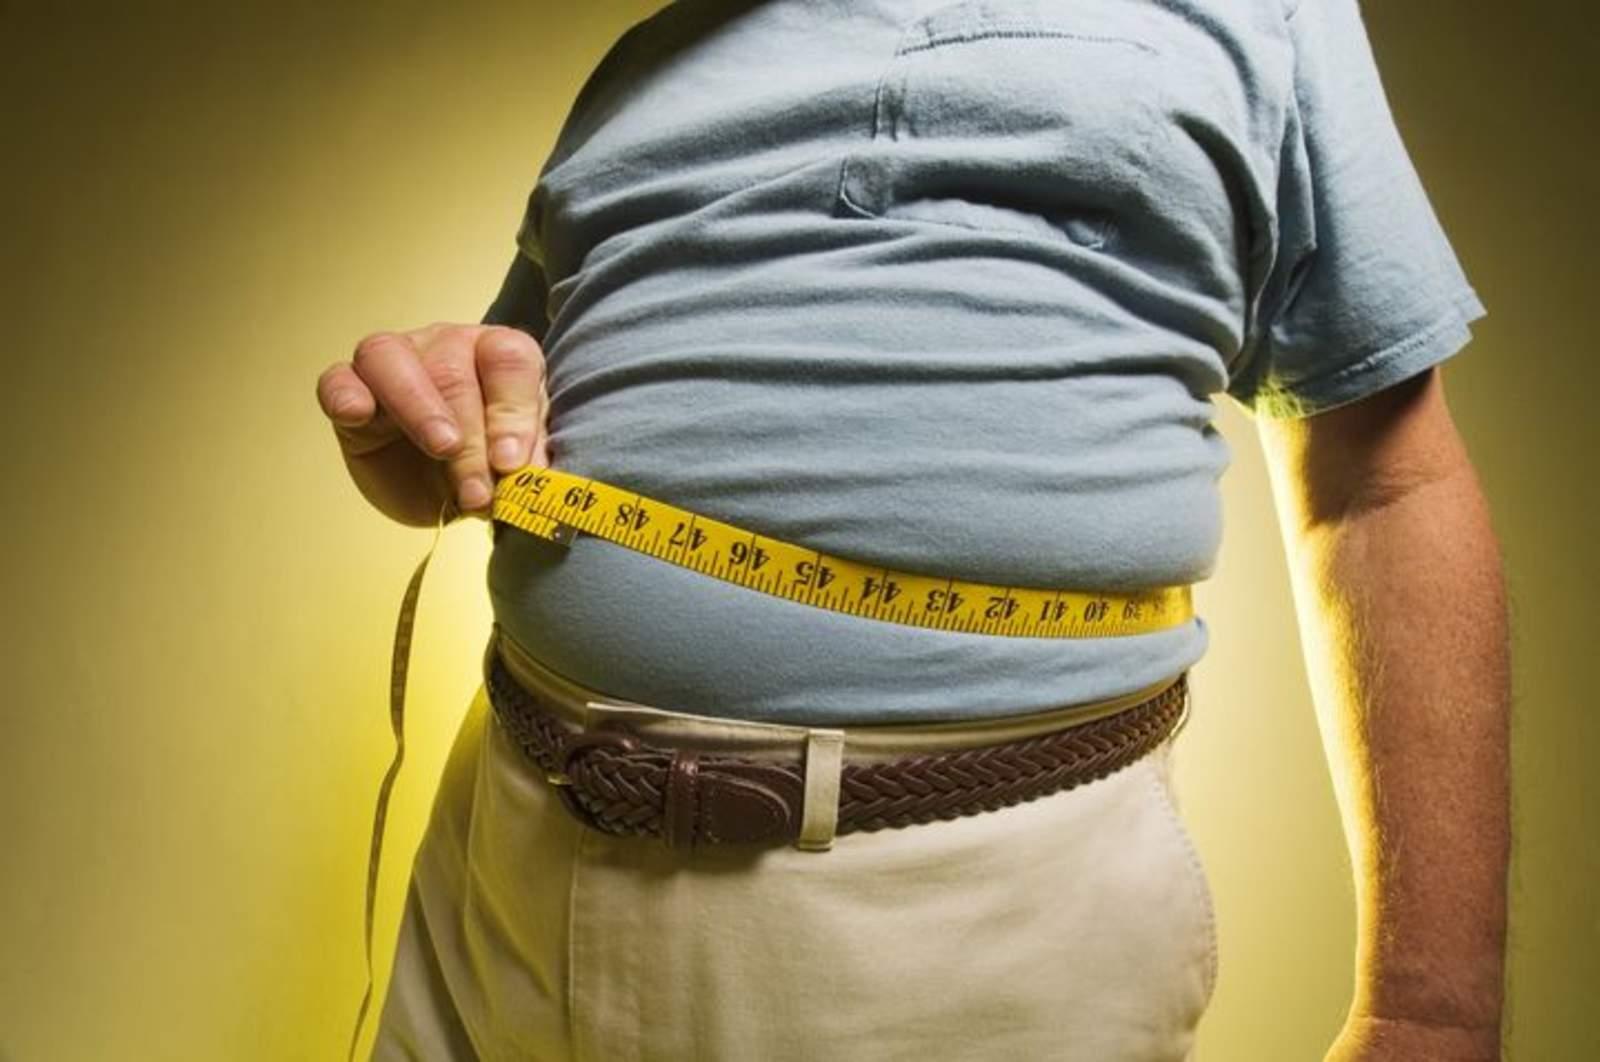 Asistir a consultas médicas, factor de éxito para bajar de peso